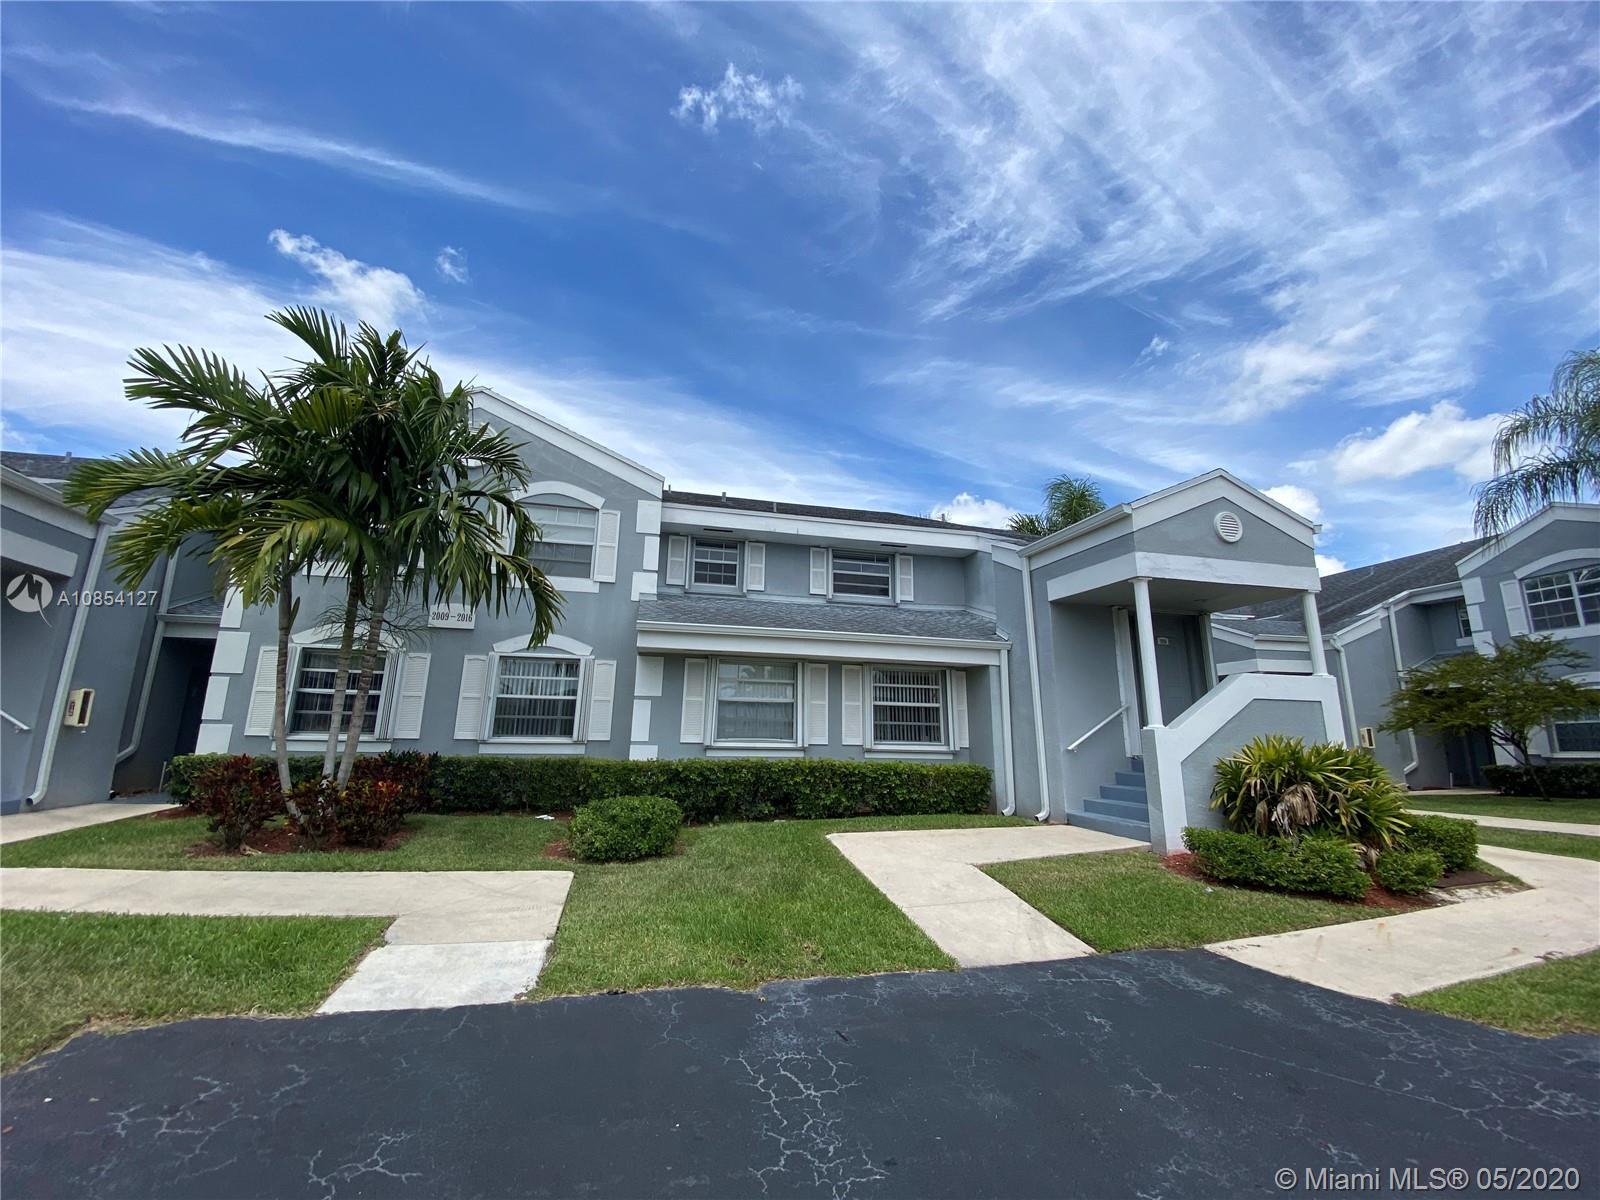 2016 SE 27th Dr #204-5B, Homestead, FL 33035 - Homestead, FL real estate listing